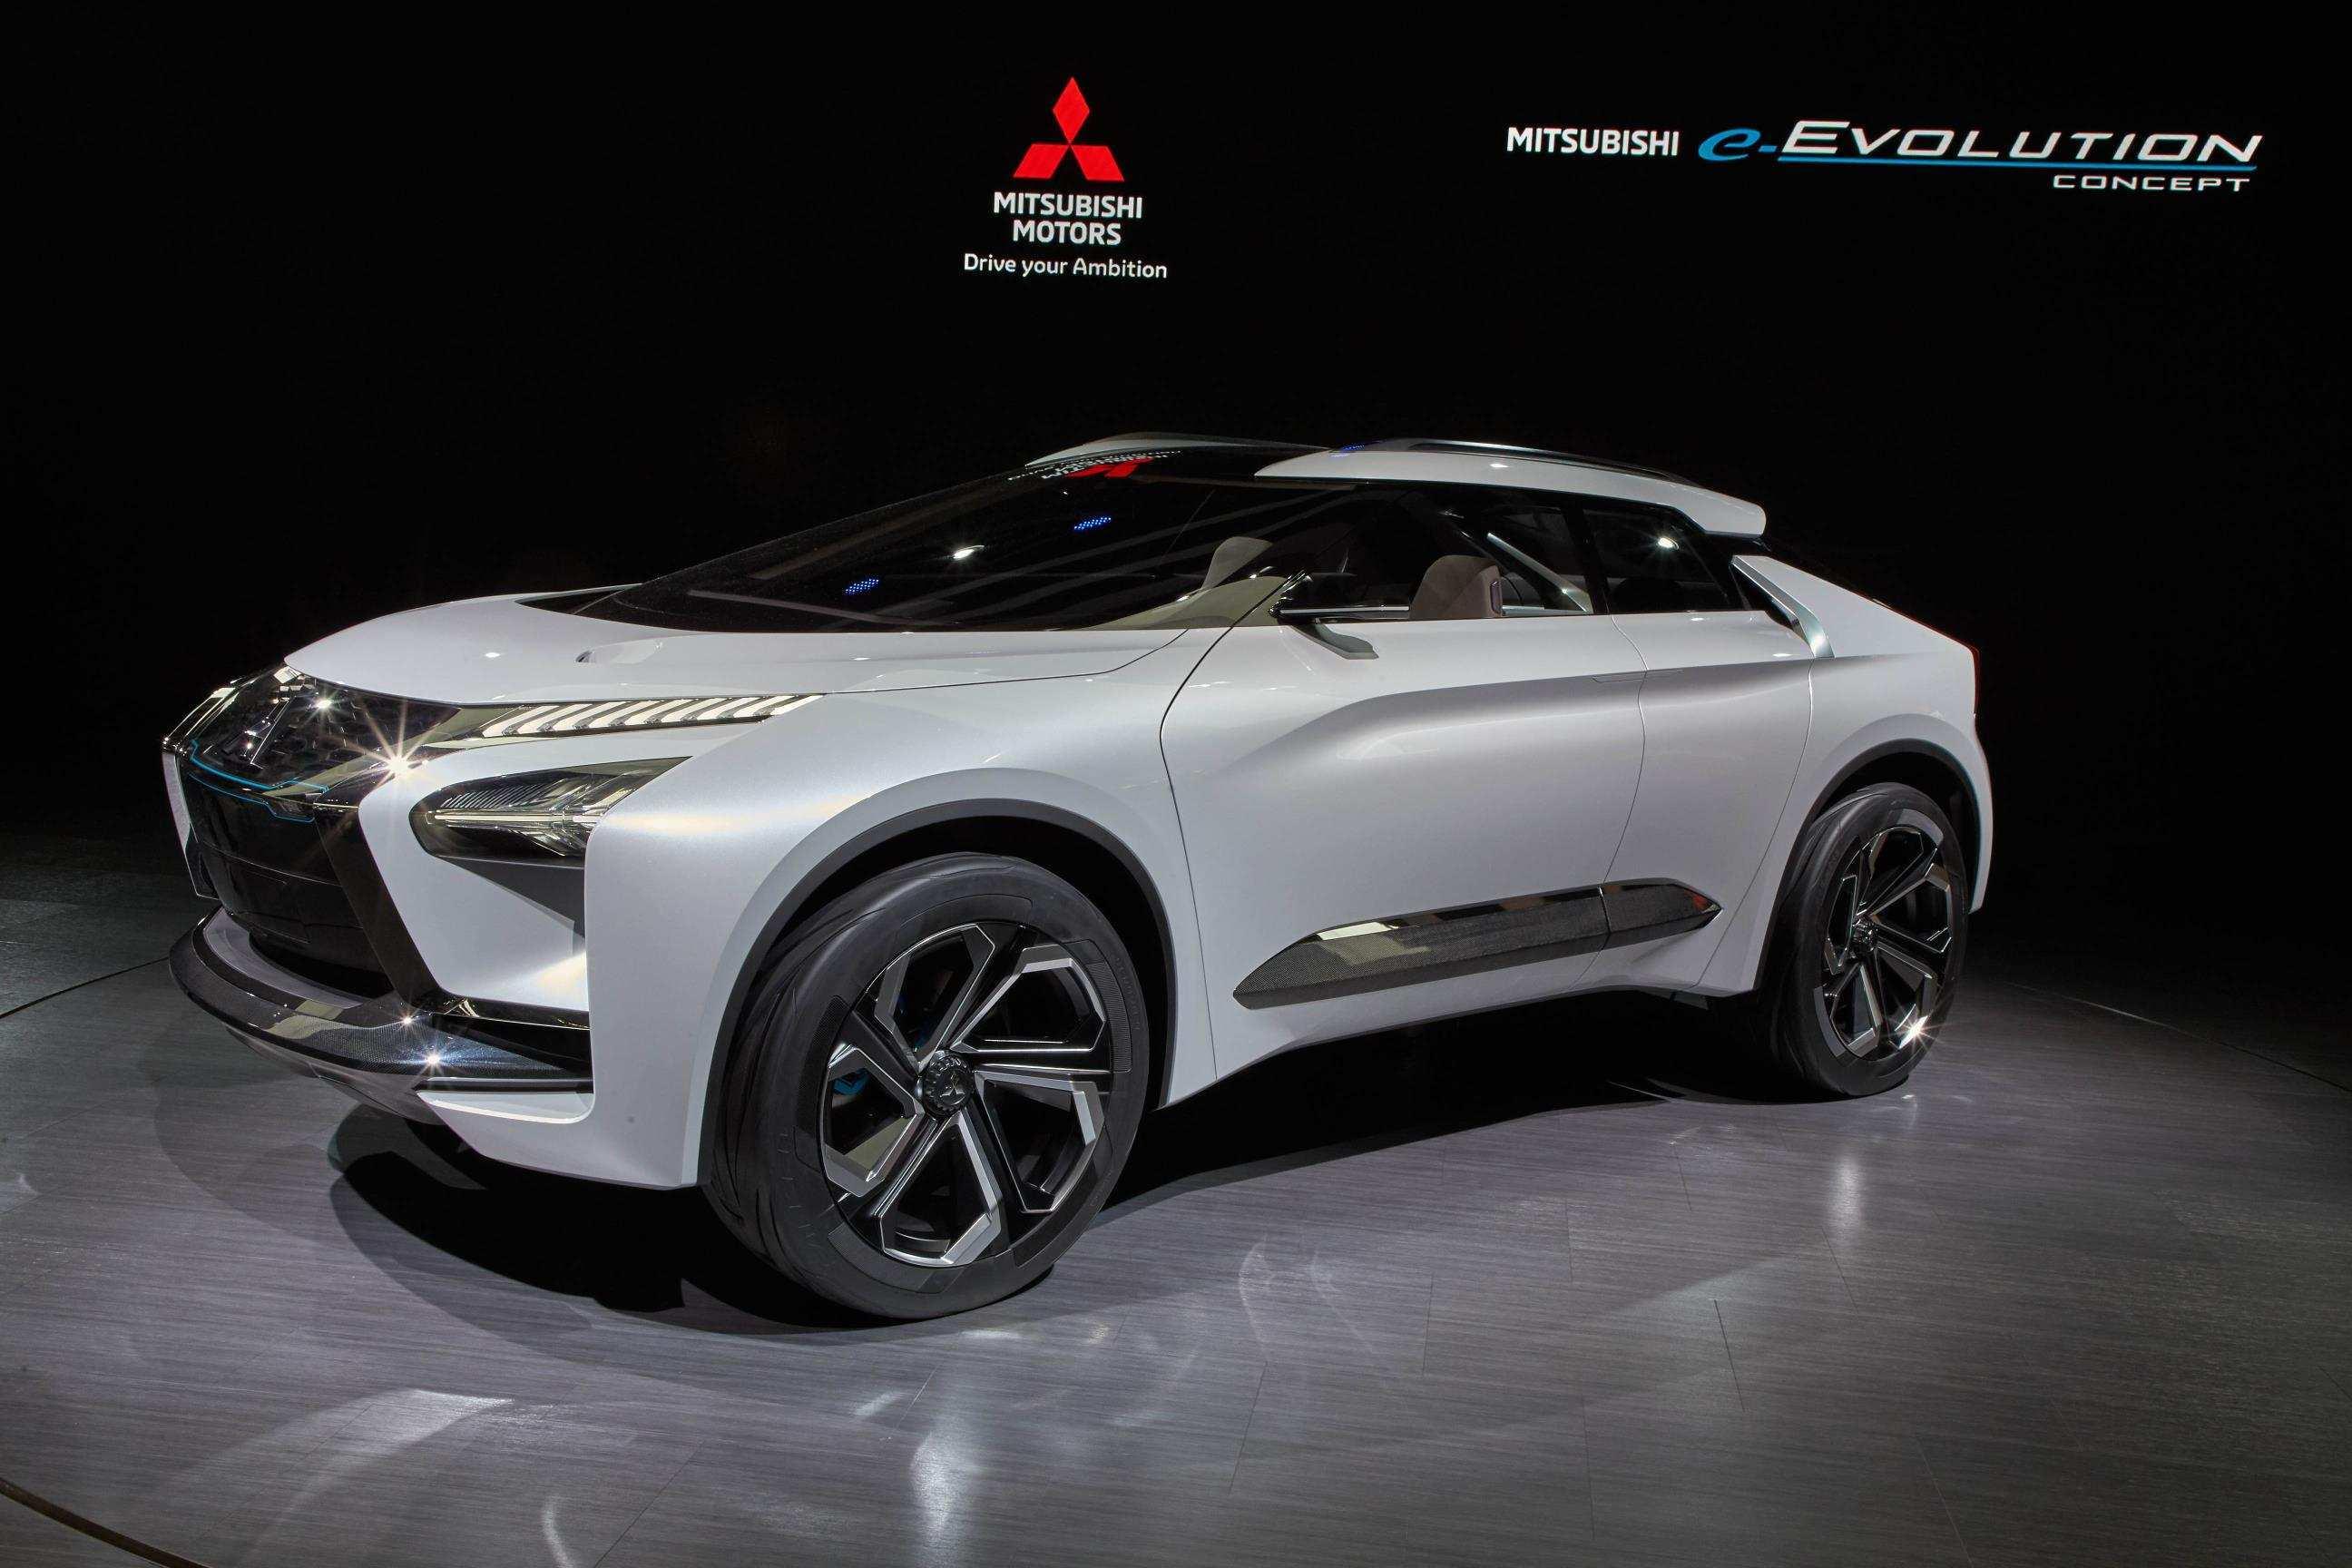 47 Great 2019 Mitsubishi Crossover Exterior for 2019 Mitsubishi Crossover